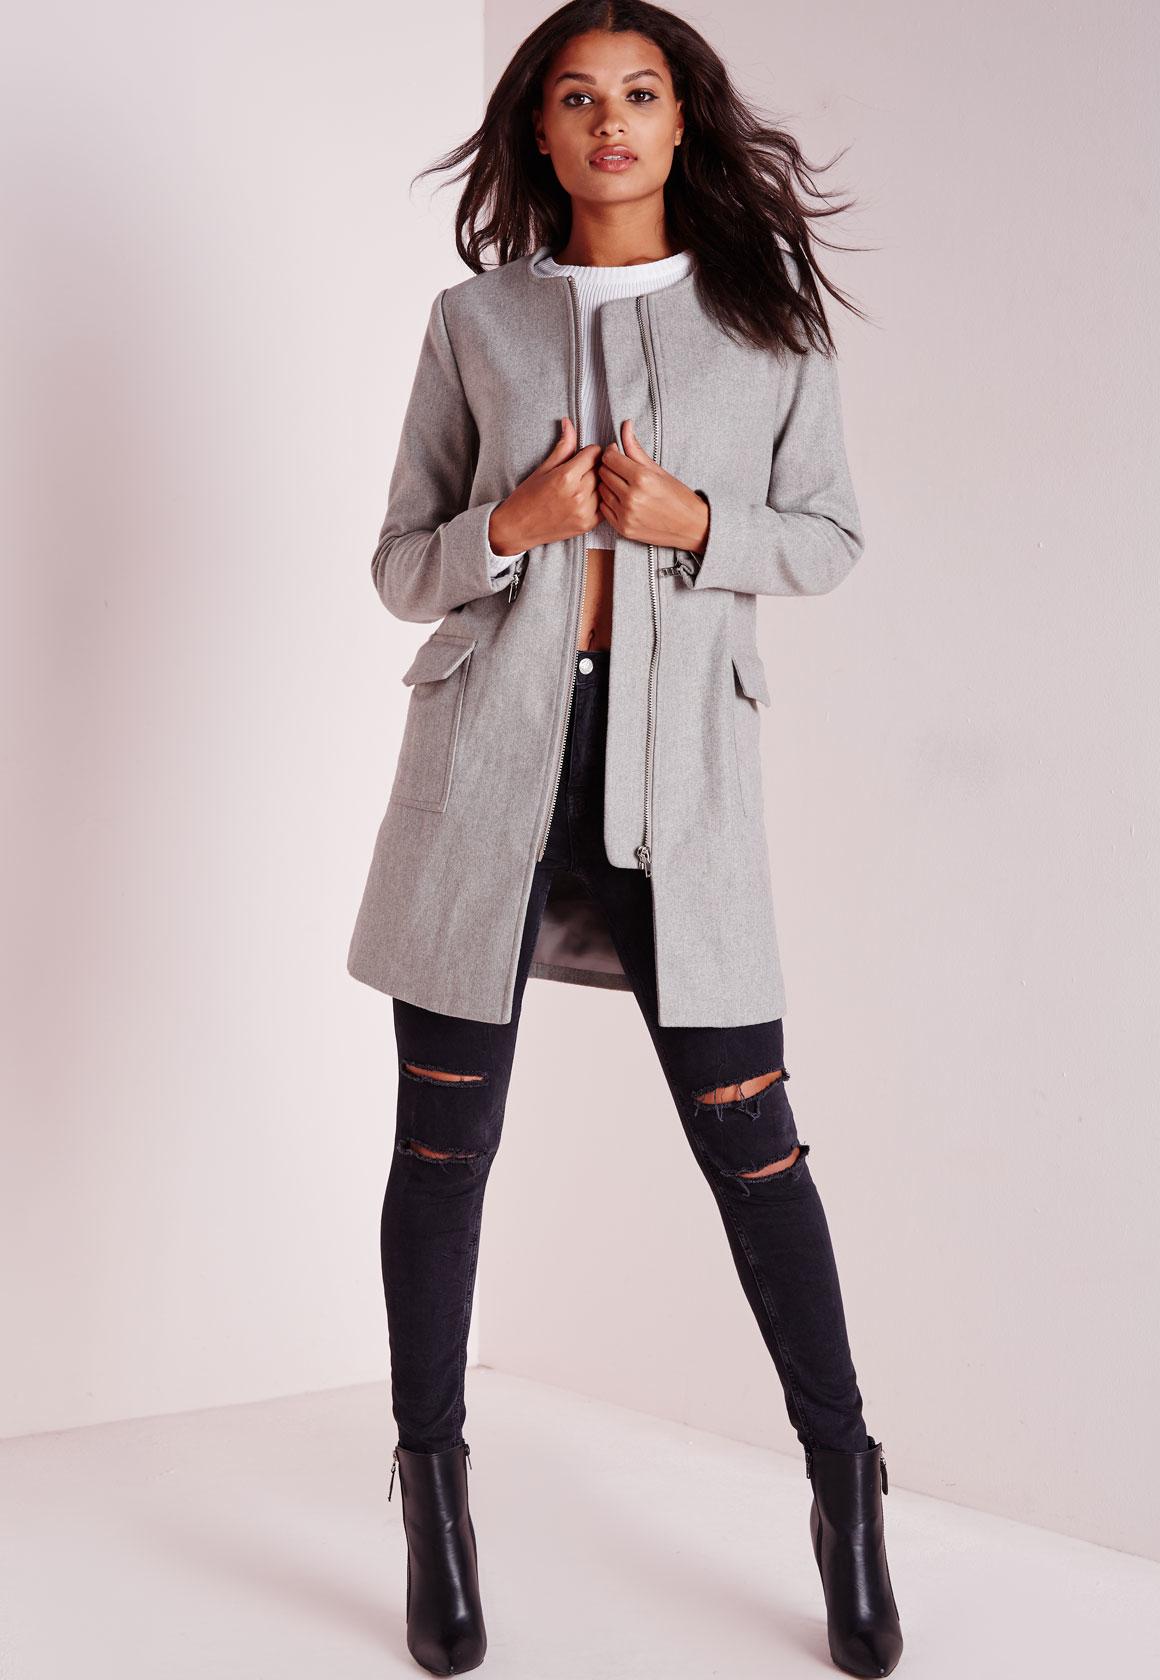 Womens Gray Coat Photo Album - Asianfashion